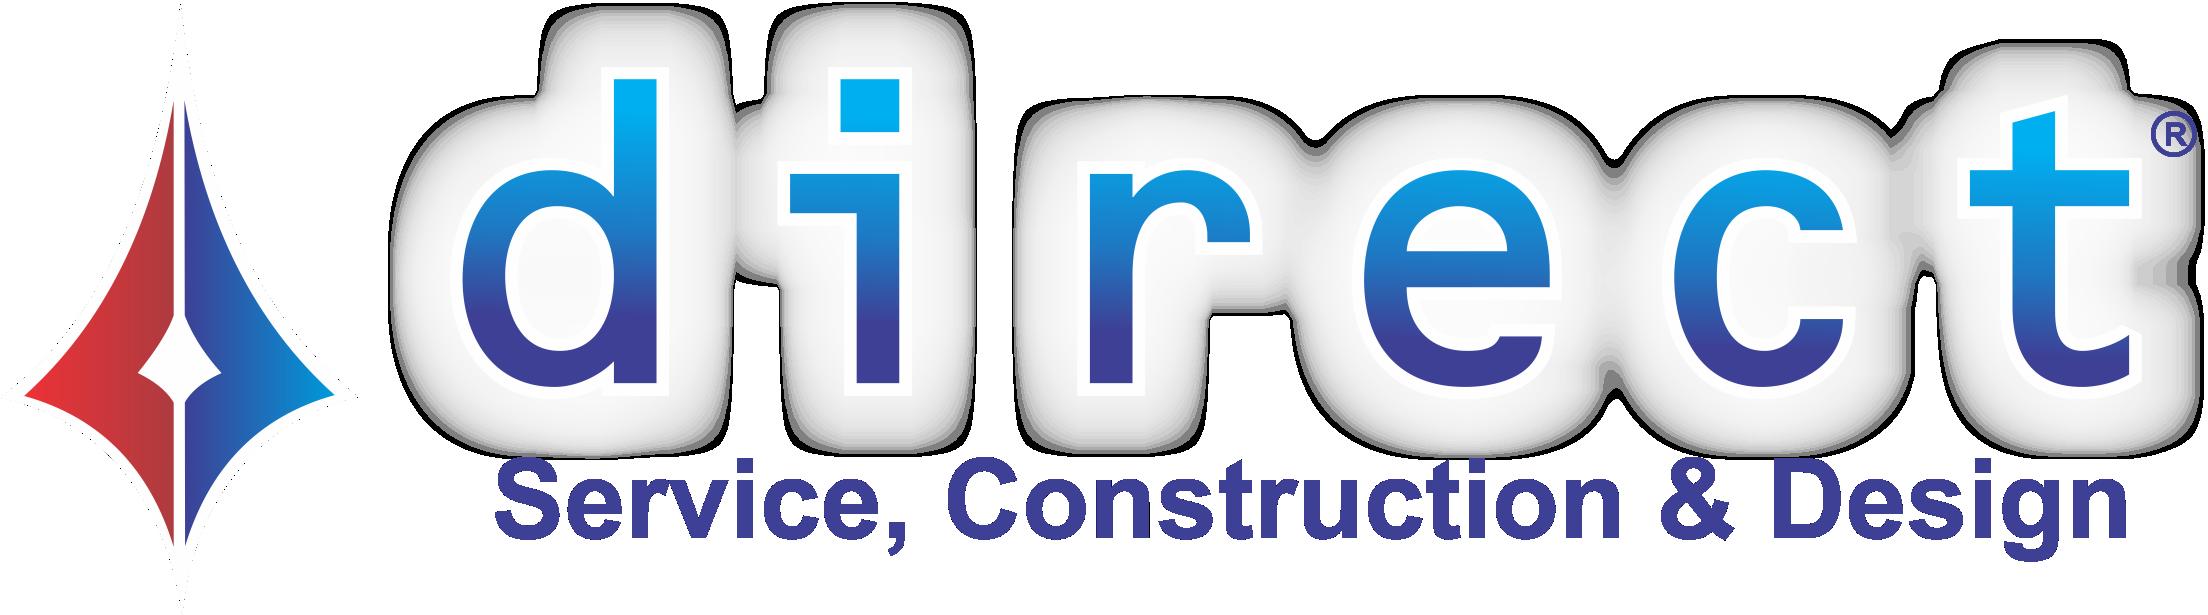 Customer Knowledge Base | Direct Service, Construction & Design